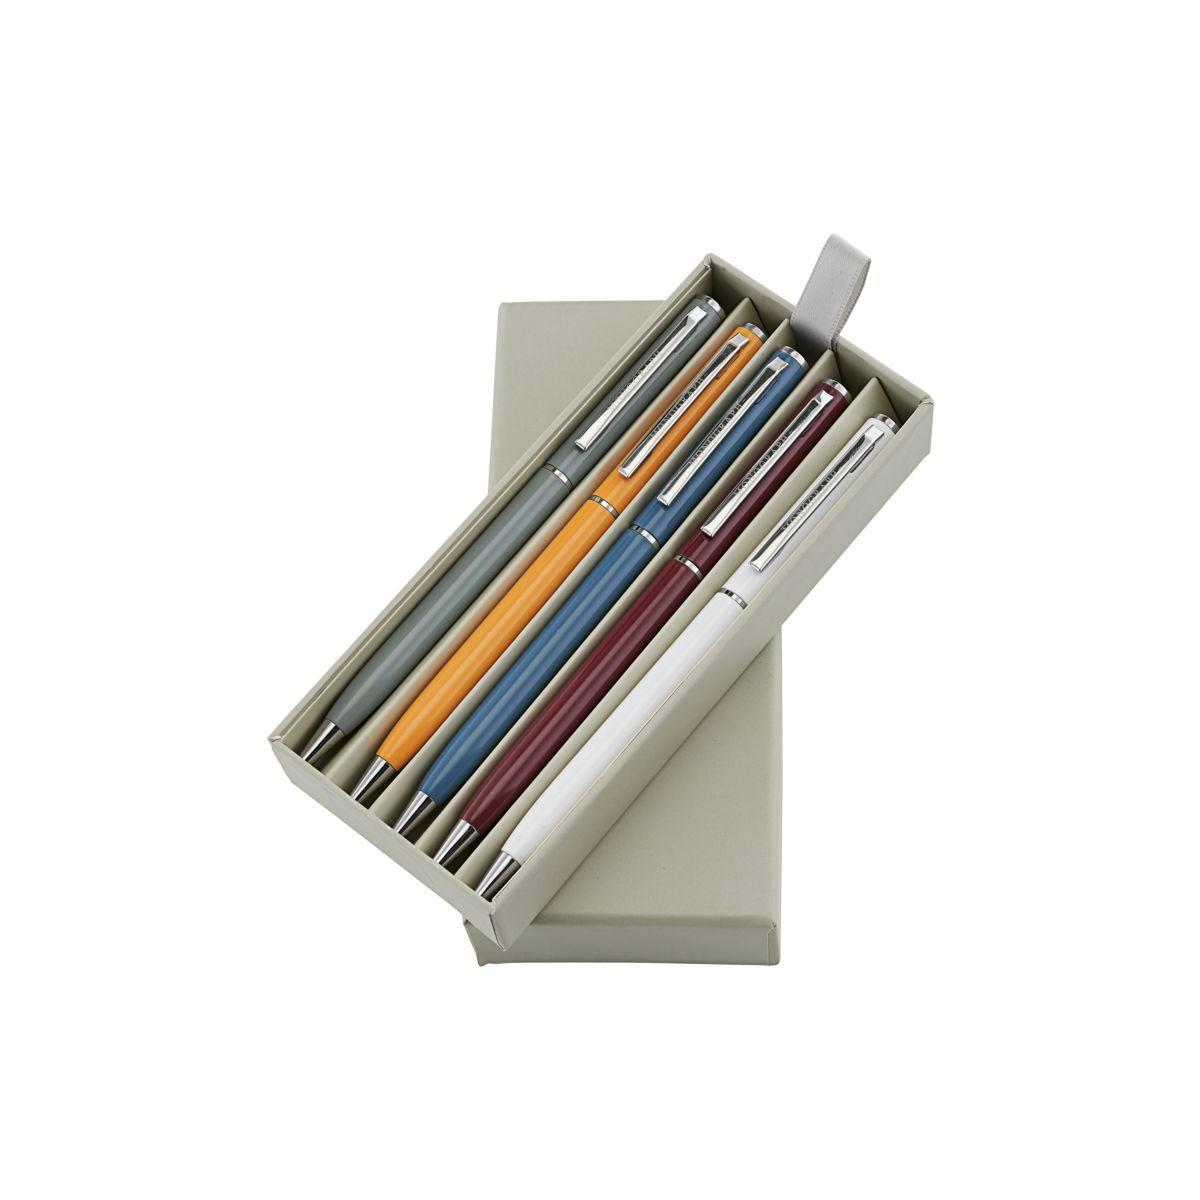 MONOGRAPH Set propisek Black Ink - 5 ks, oranžová barva, šedá barva, bílá barva, hnědá barva, kov, plast